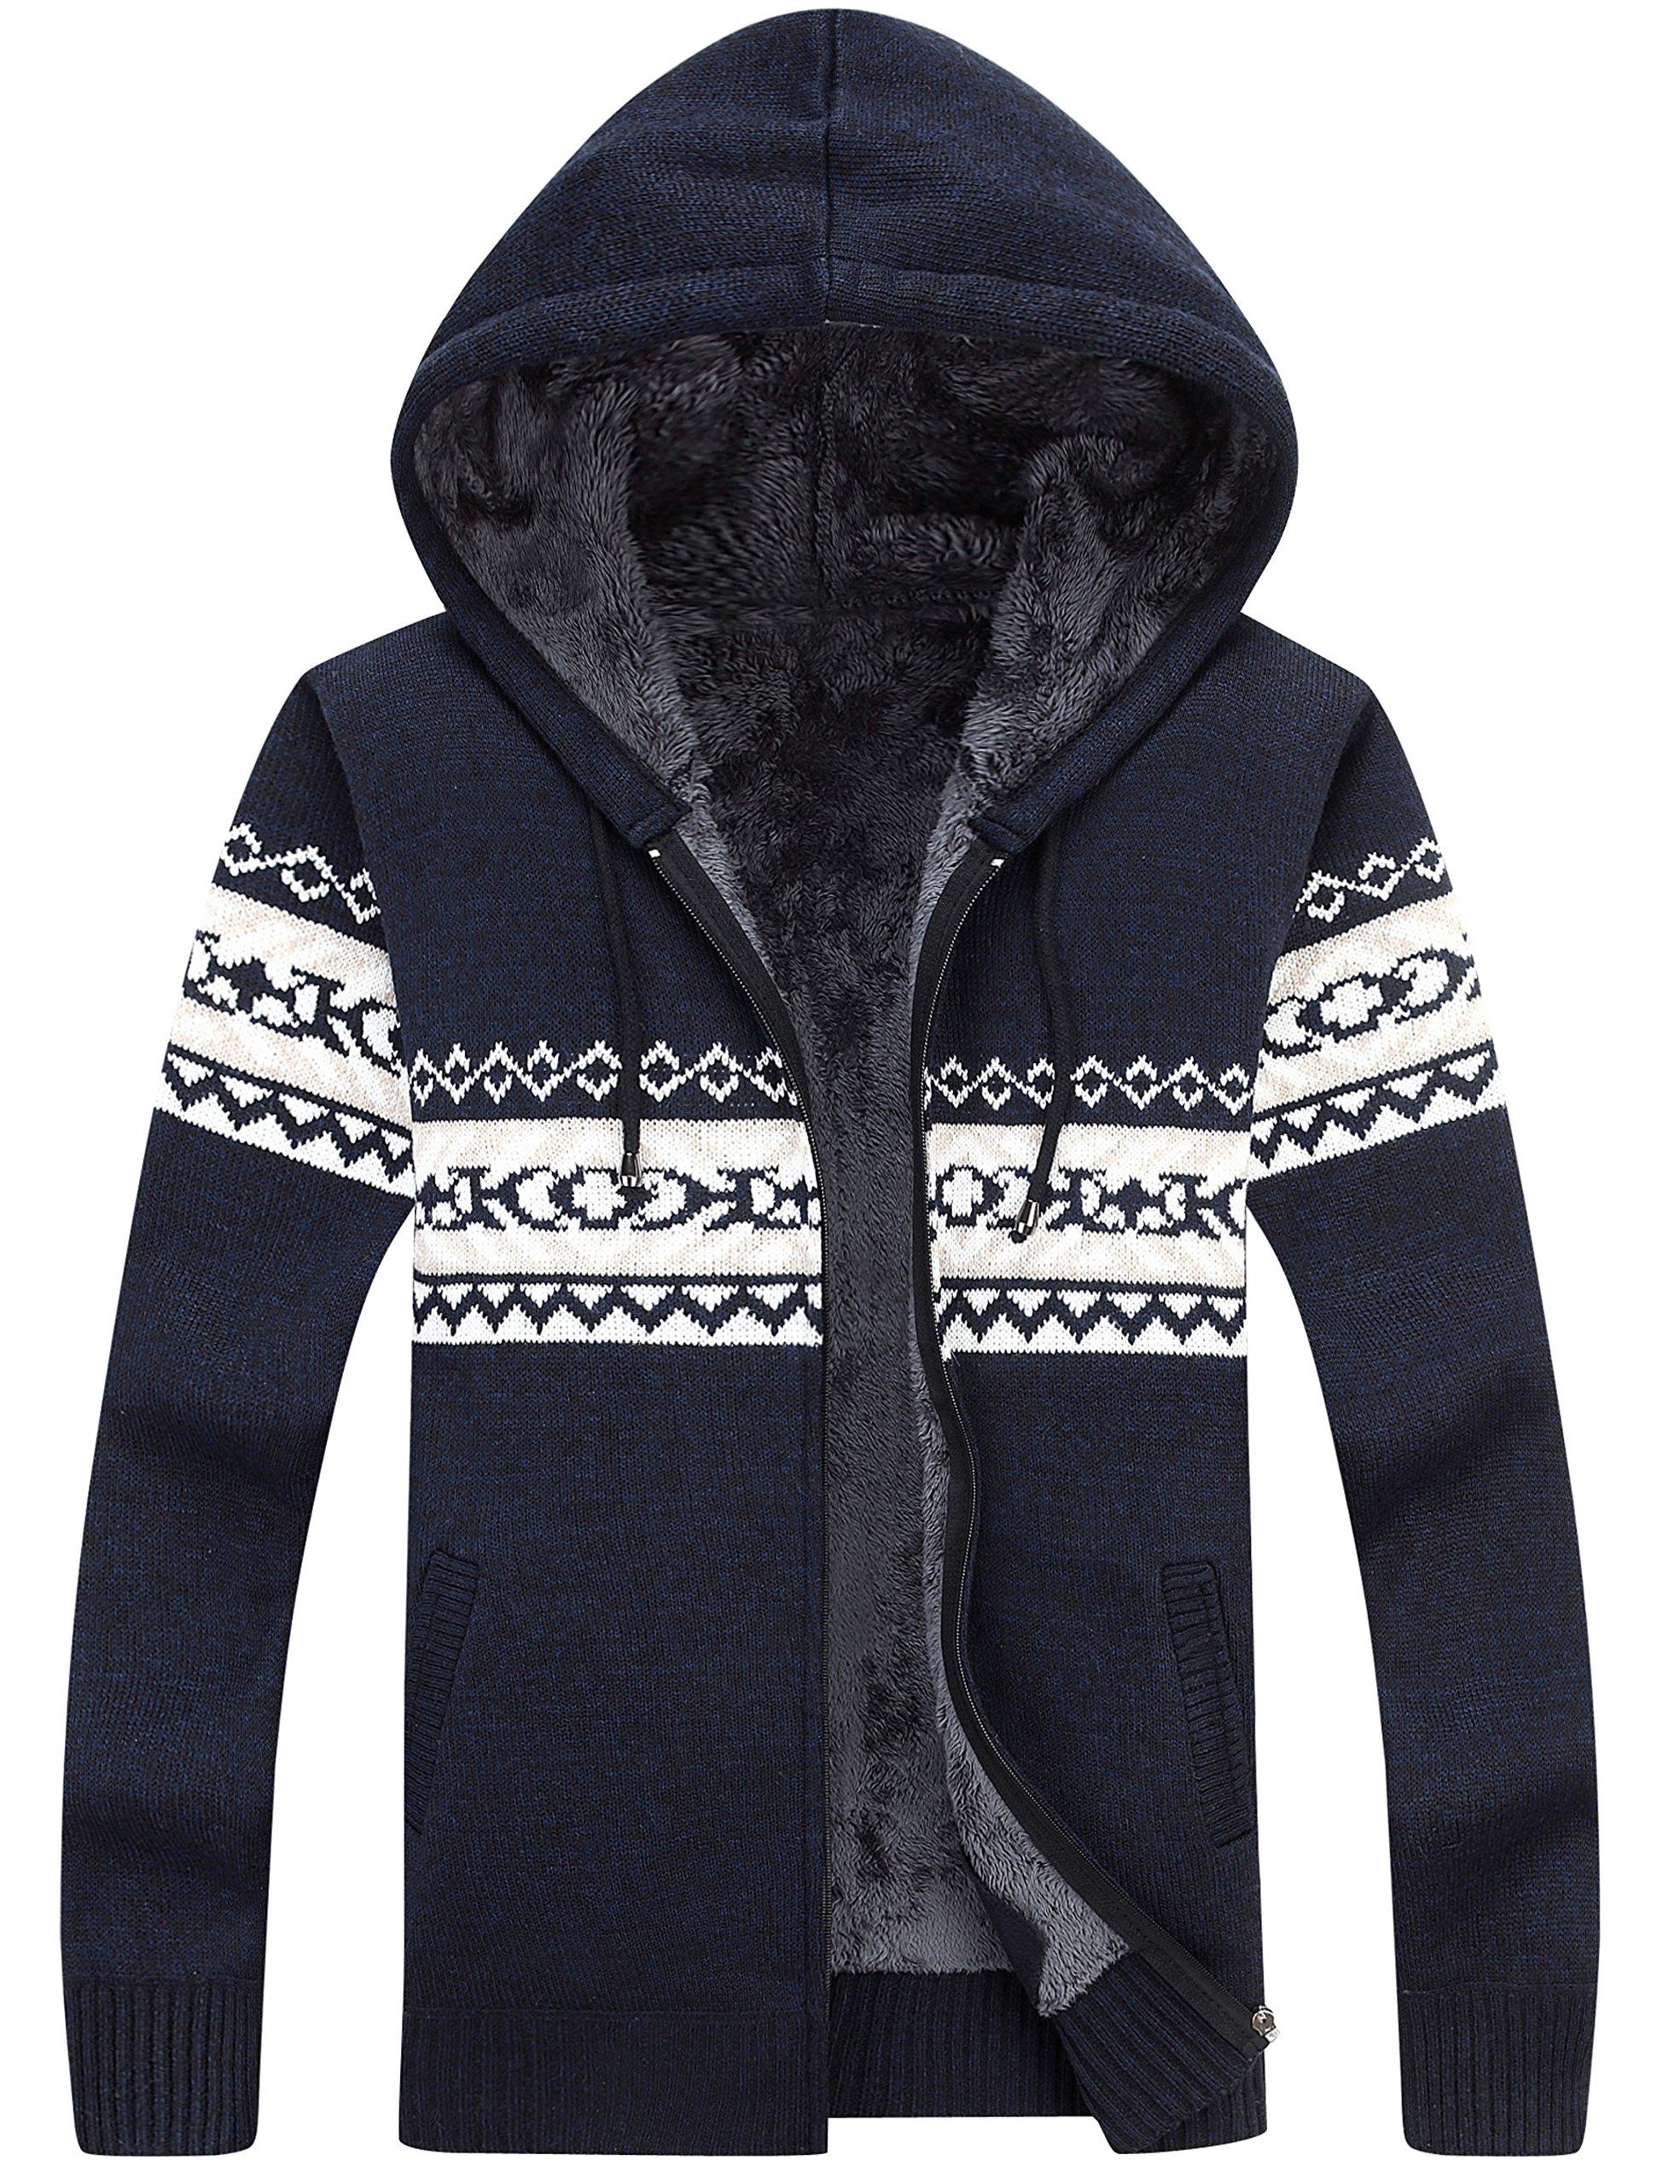 Lentta Men's Casual Slim Fit Full Zip up Sherpa Lined Hooded Cardigan Sweaters (Medium, Dark Blue)